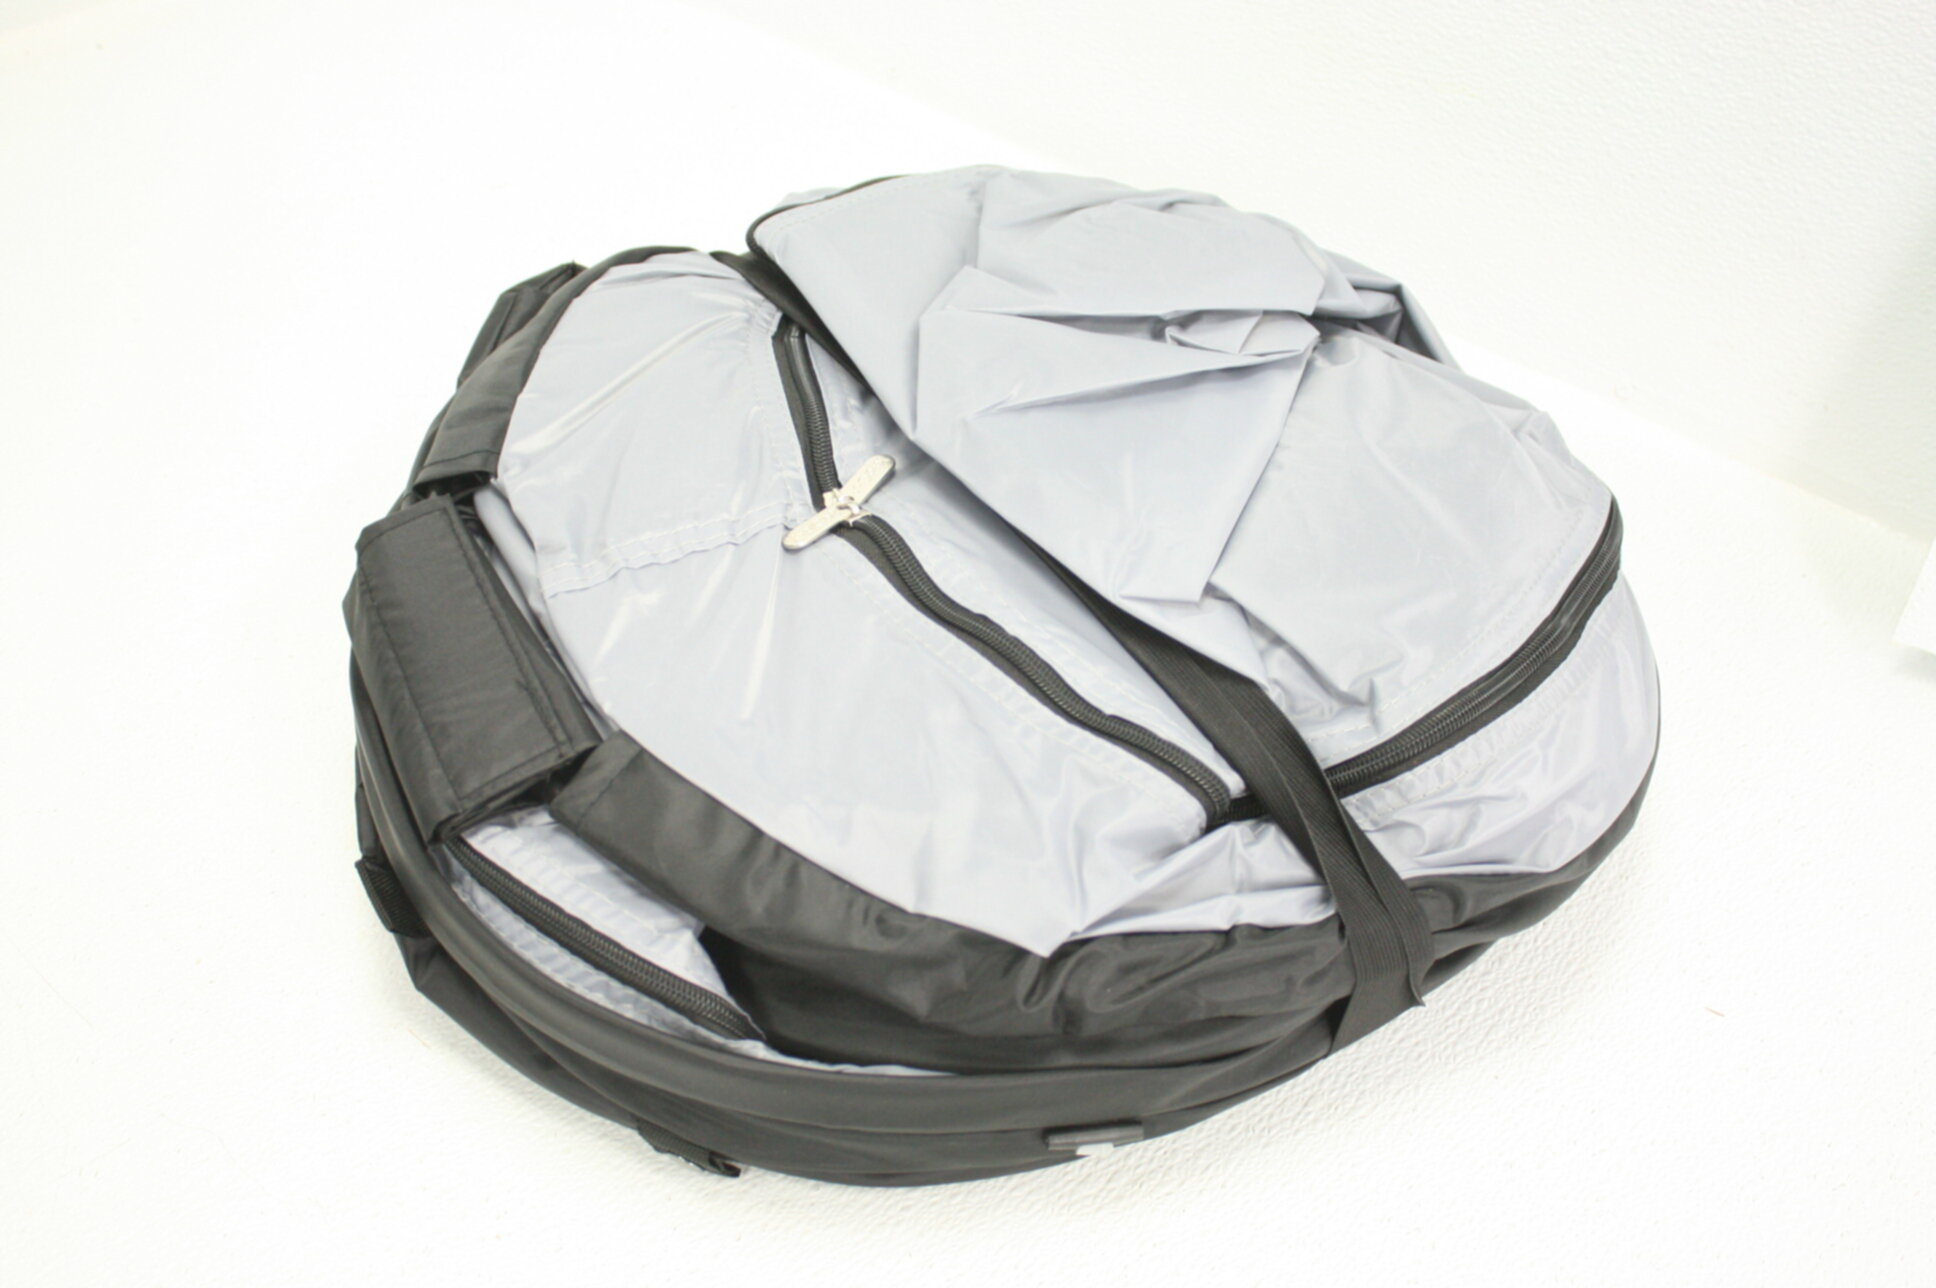 KidCo P4013 - Peapod Plus Portable Travel Bed Camo for